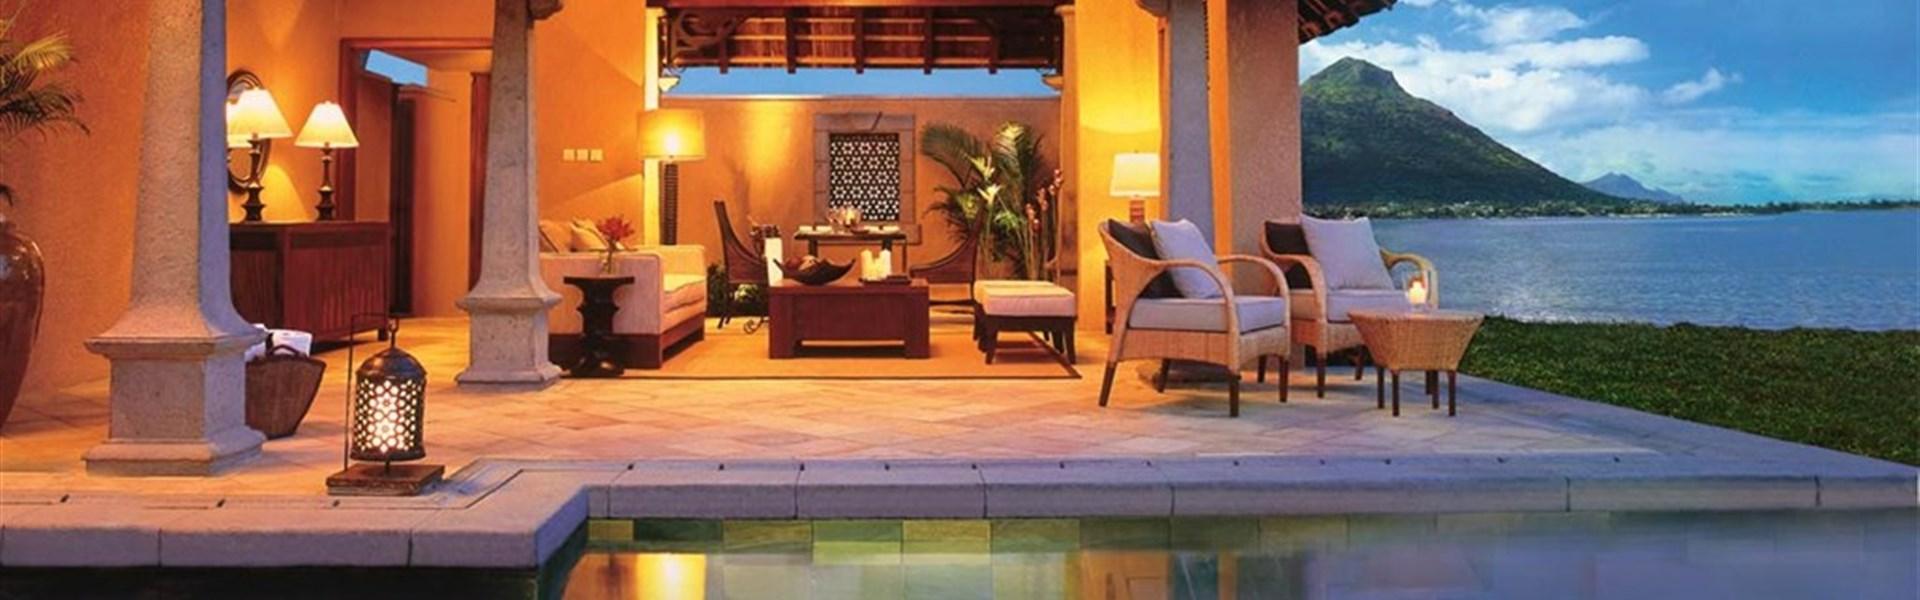 Marco Polo - Maradiva Villas Resort + Spa - Beachfront Luxury Suite Pool Villa